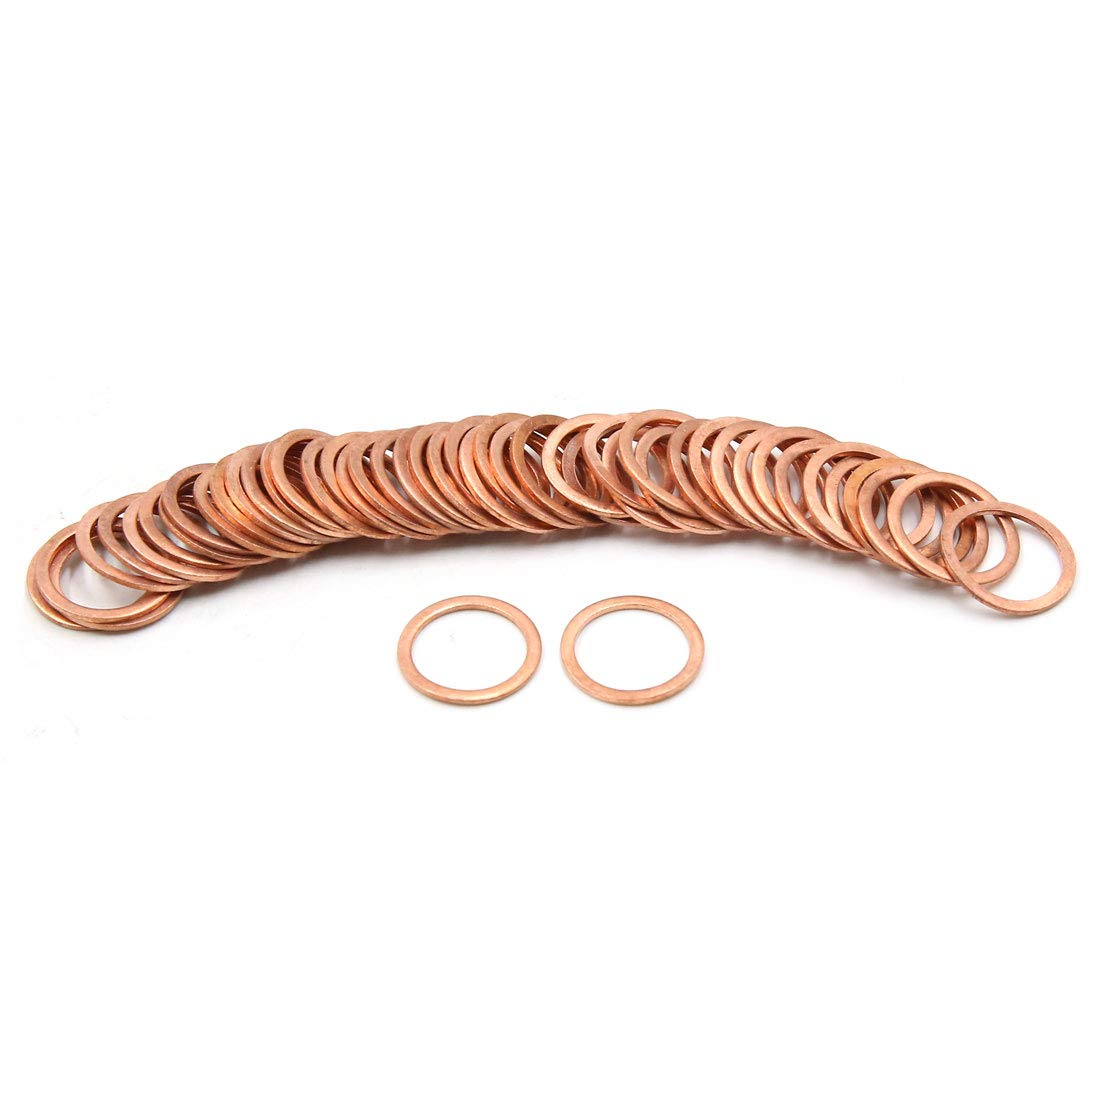 X AUTOHAUX Copper Crush Washers Flat Car Sealing Gaskets Rings 14 x 18mm Dia 50pcs by X AUTOHAUX (Image #1)